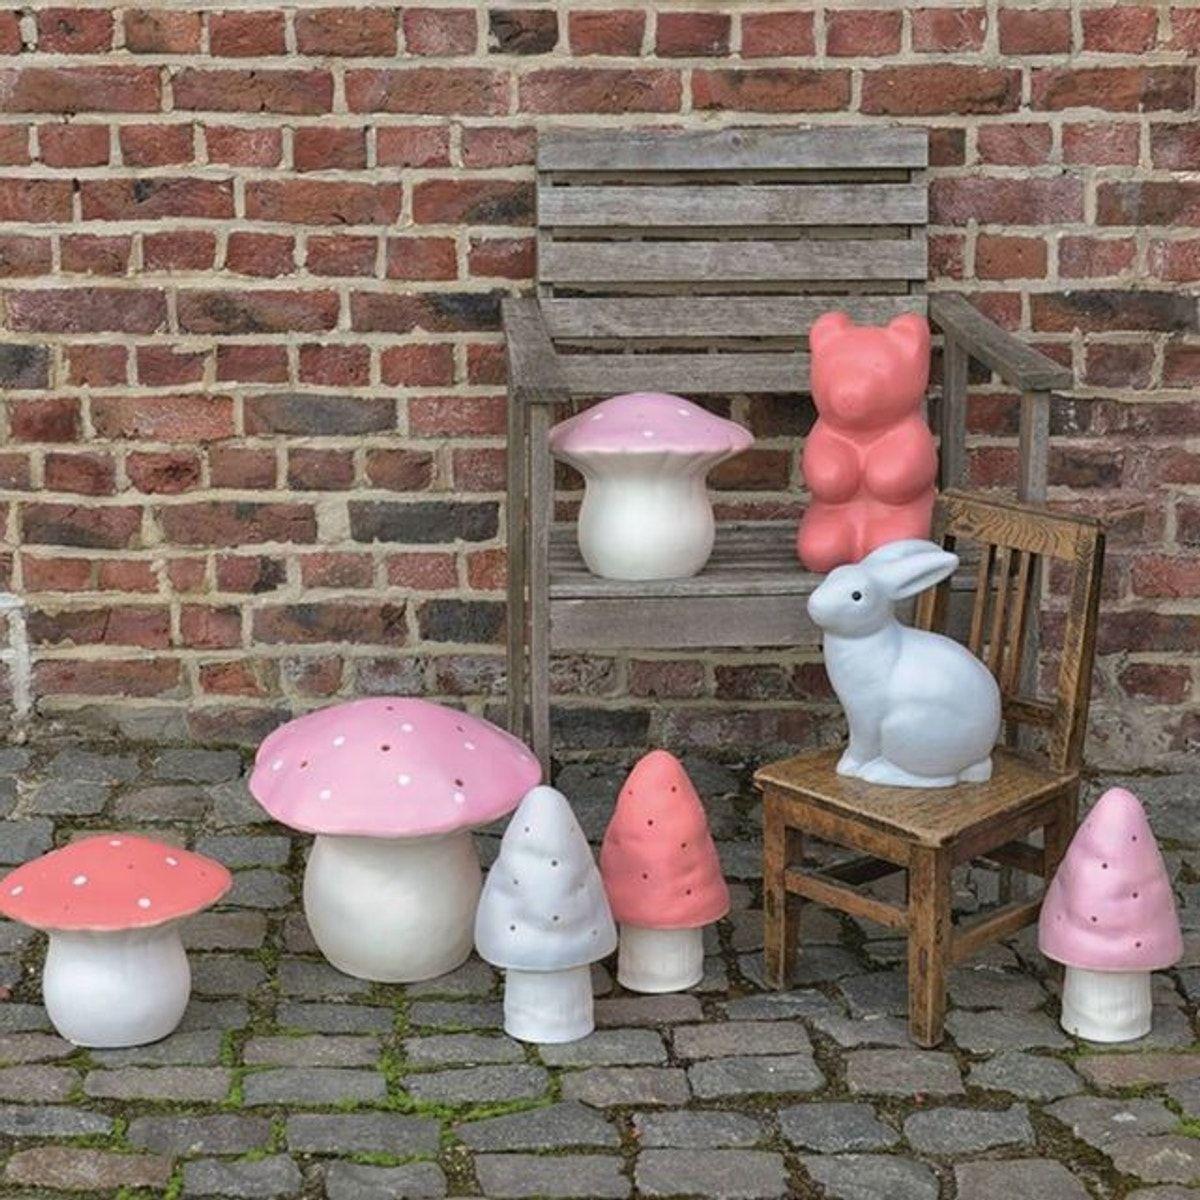 Lampe champignon grand mod/èle Peach Egmont Toys